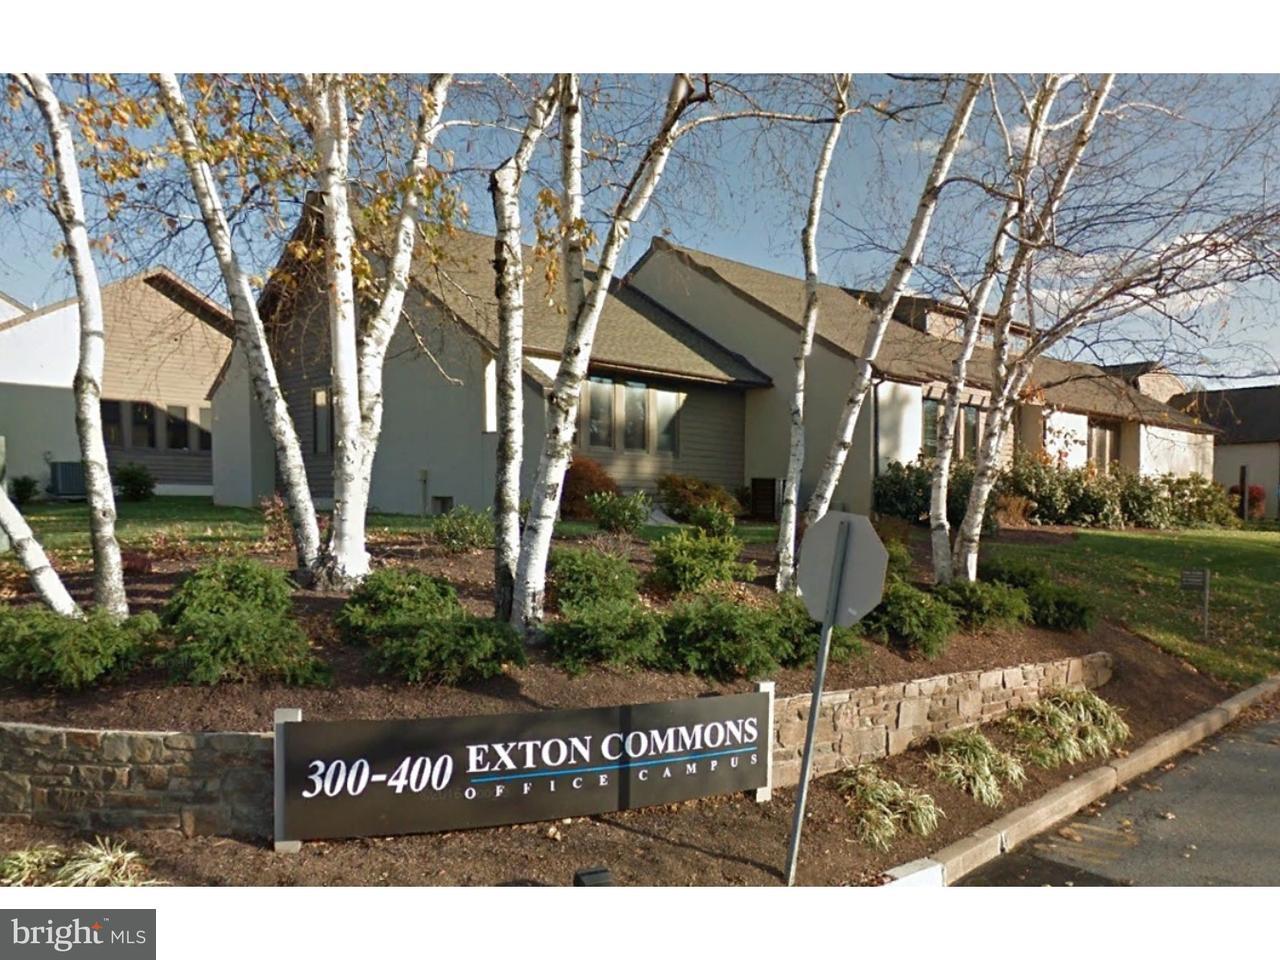 431  Exton Cmns Exton , PA 19341